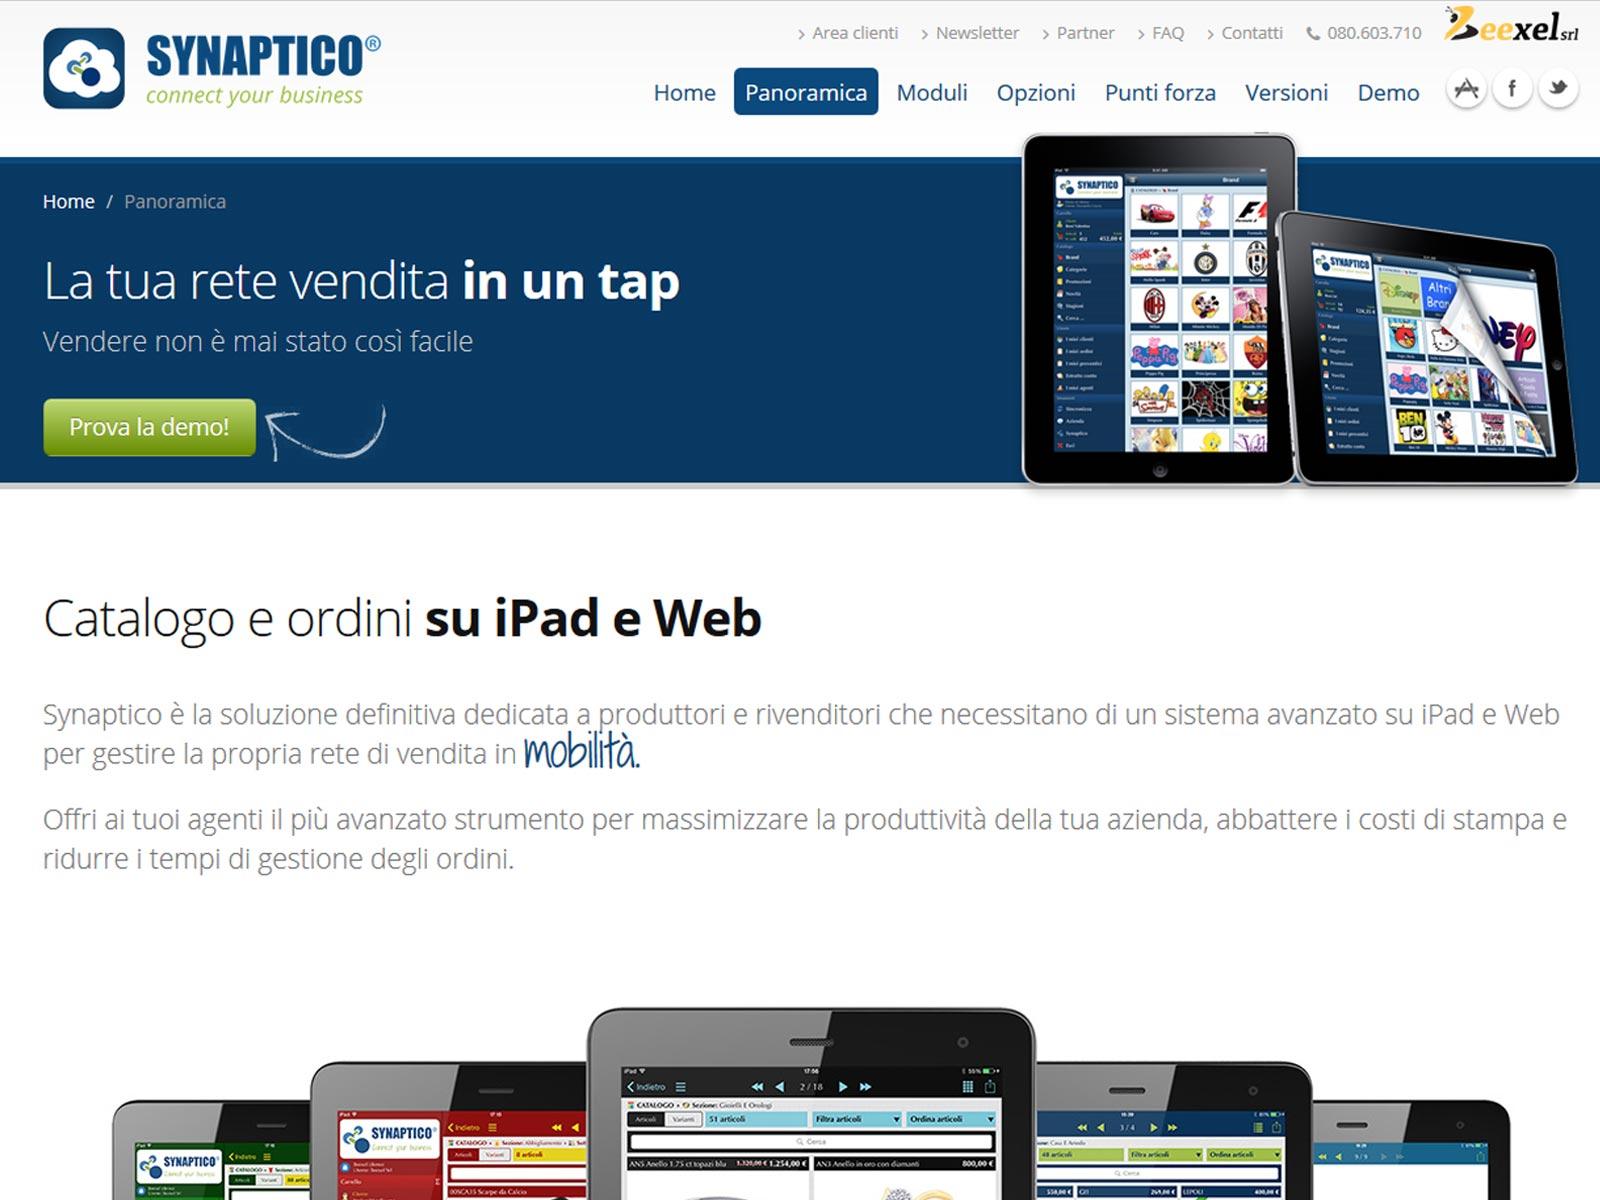 synaptico-ipad-catalogo portfolio beexel